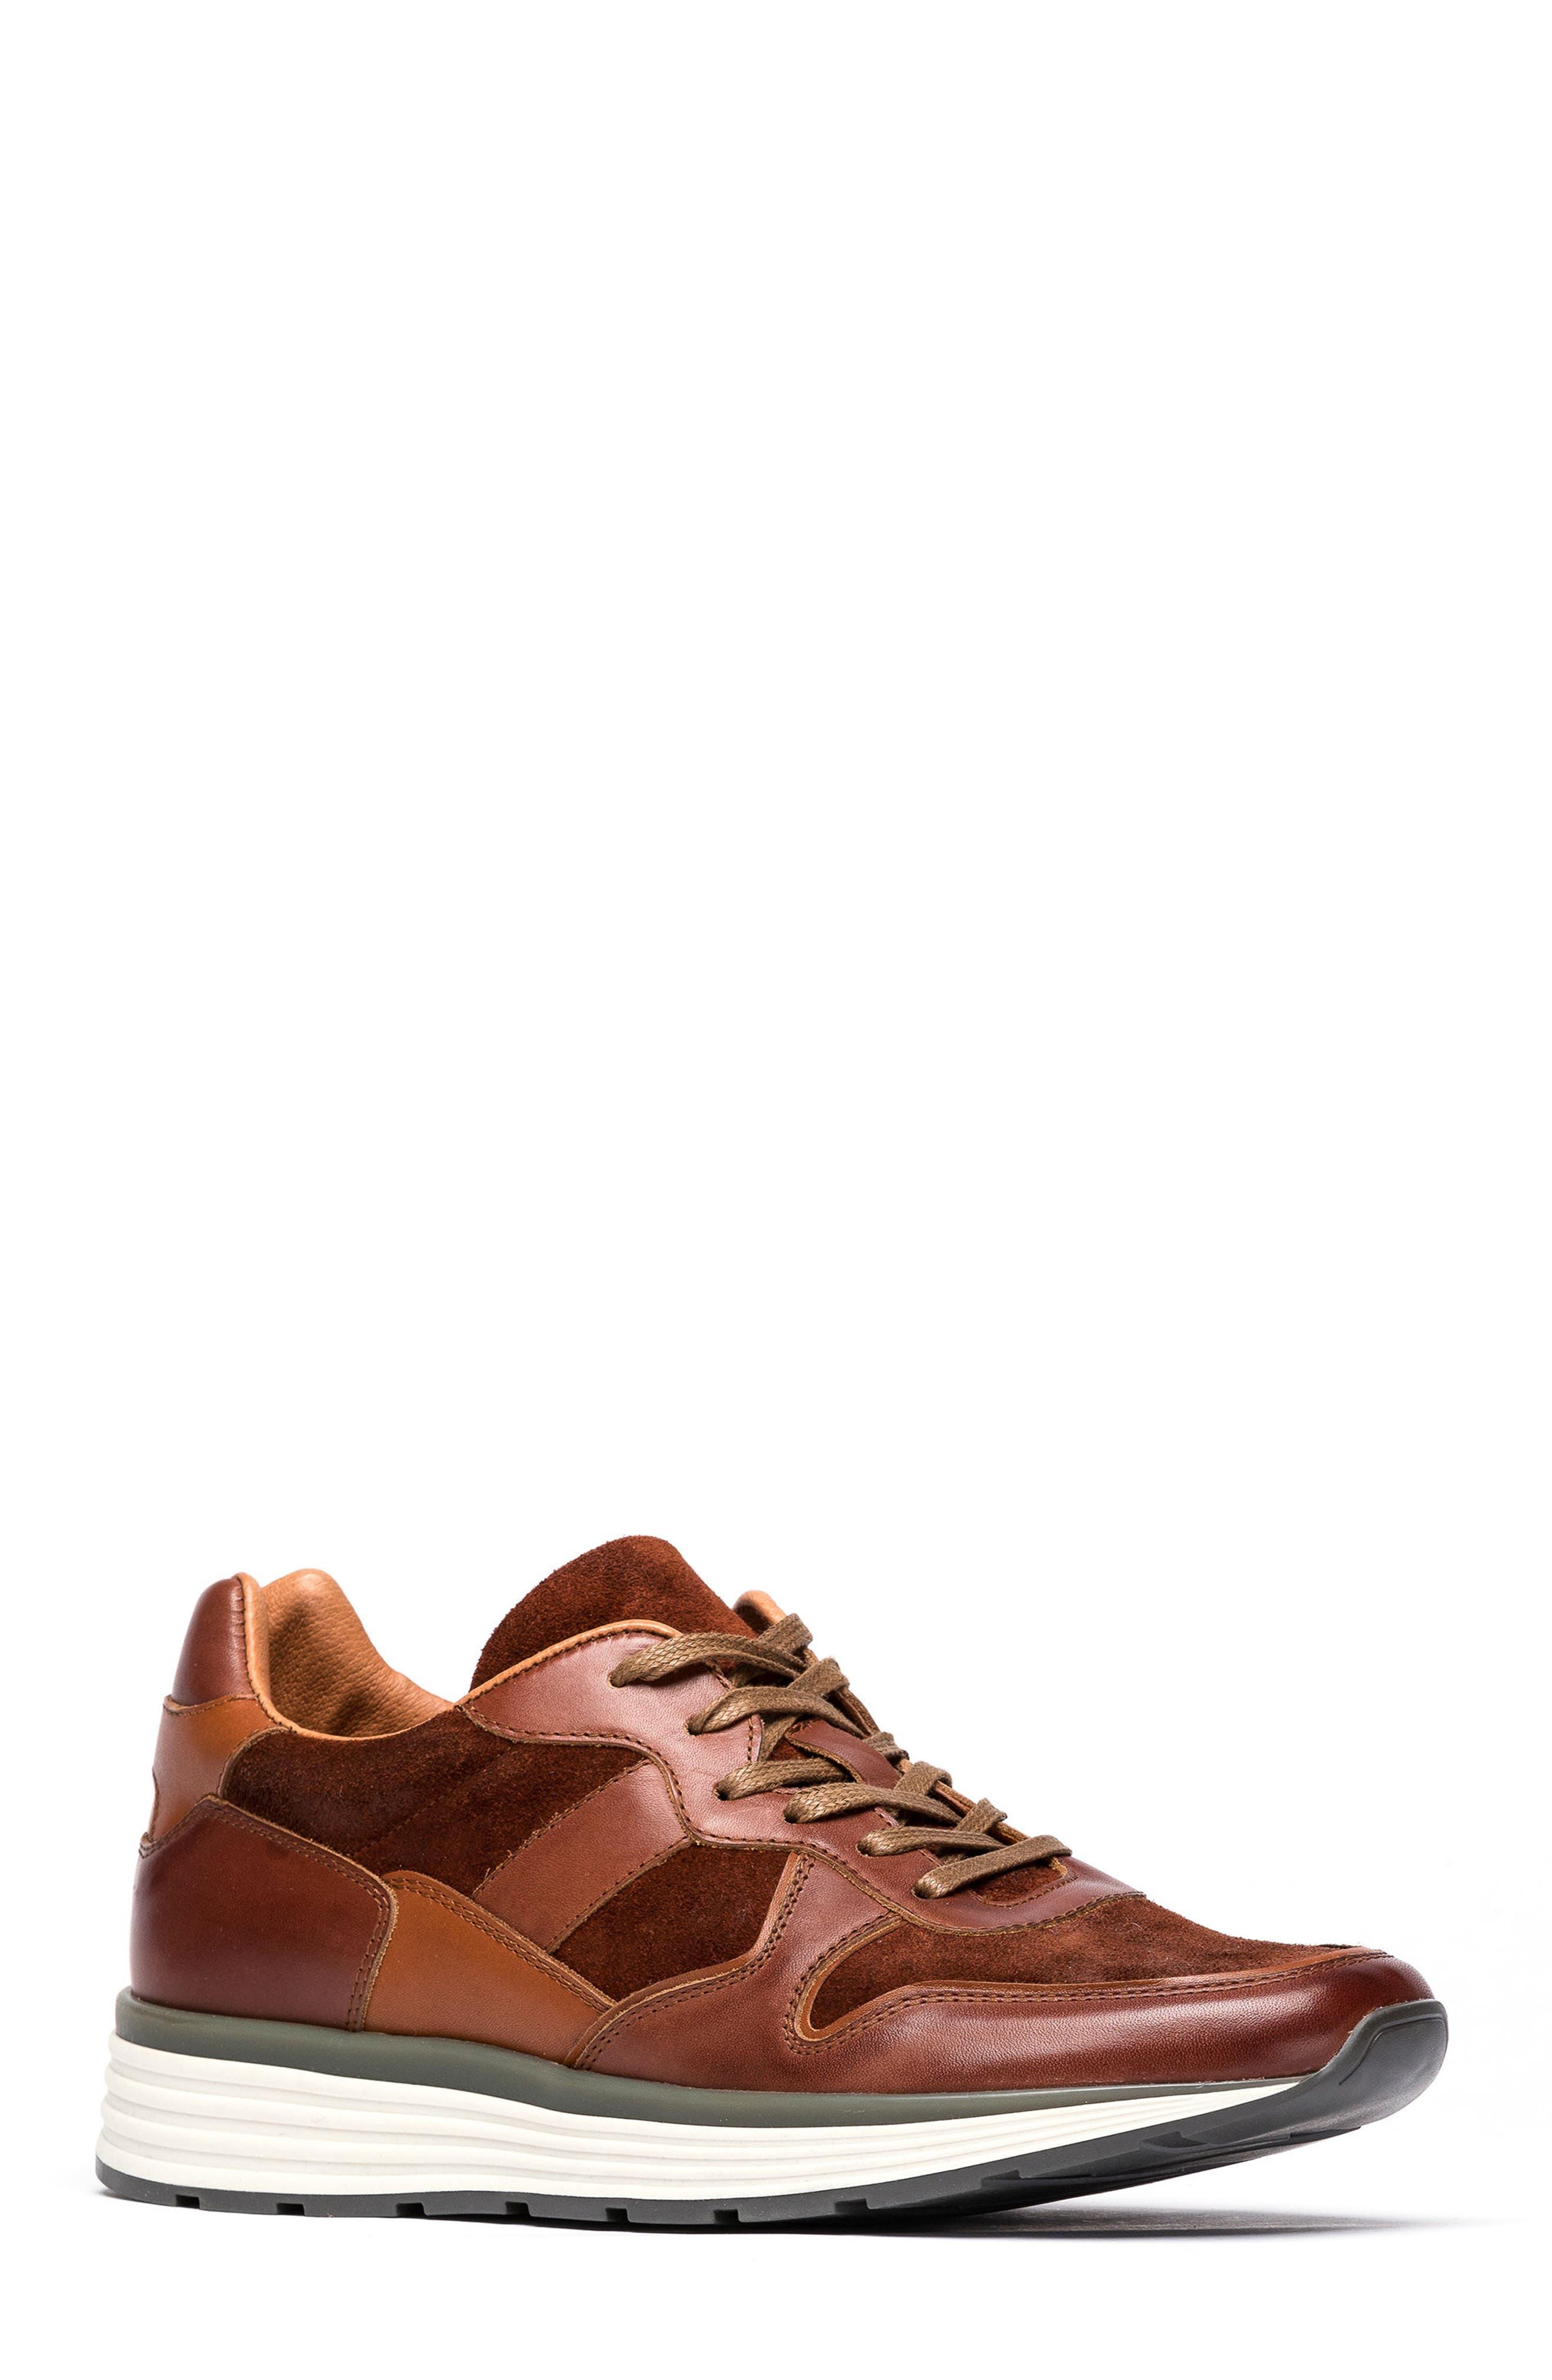 Hickory Sneaker,                             Main thumbnail 1, color,                             208